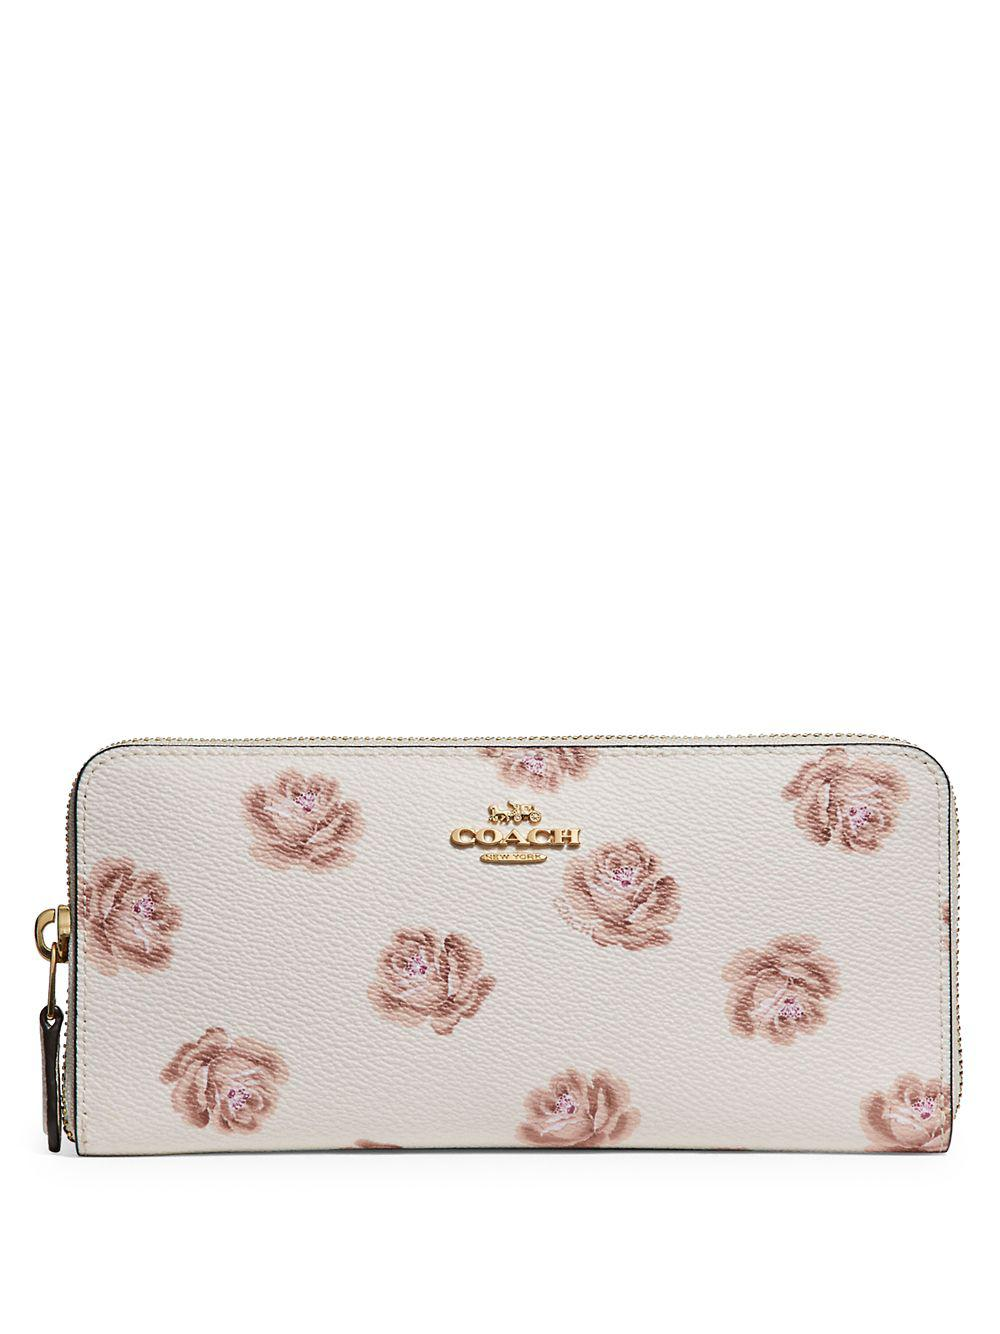 3686eefedb74 Coach Slim Accordion Canvas Continental Wallet in White - Lyst